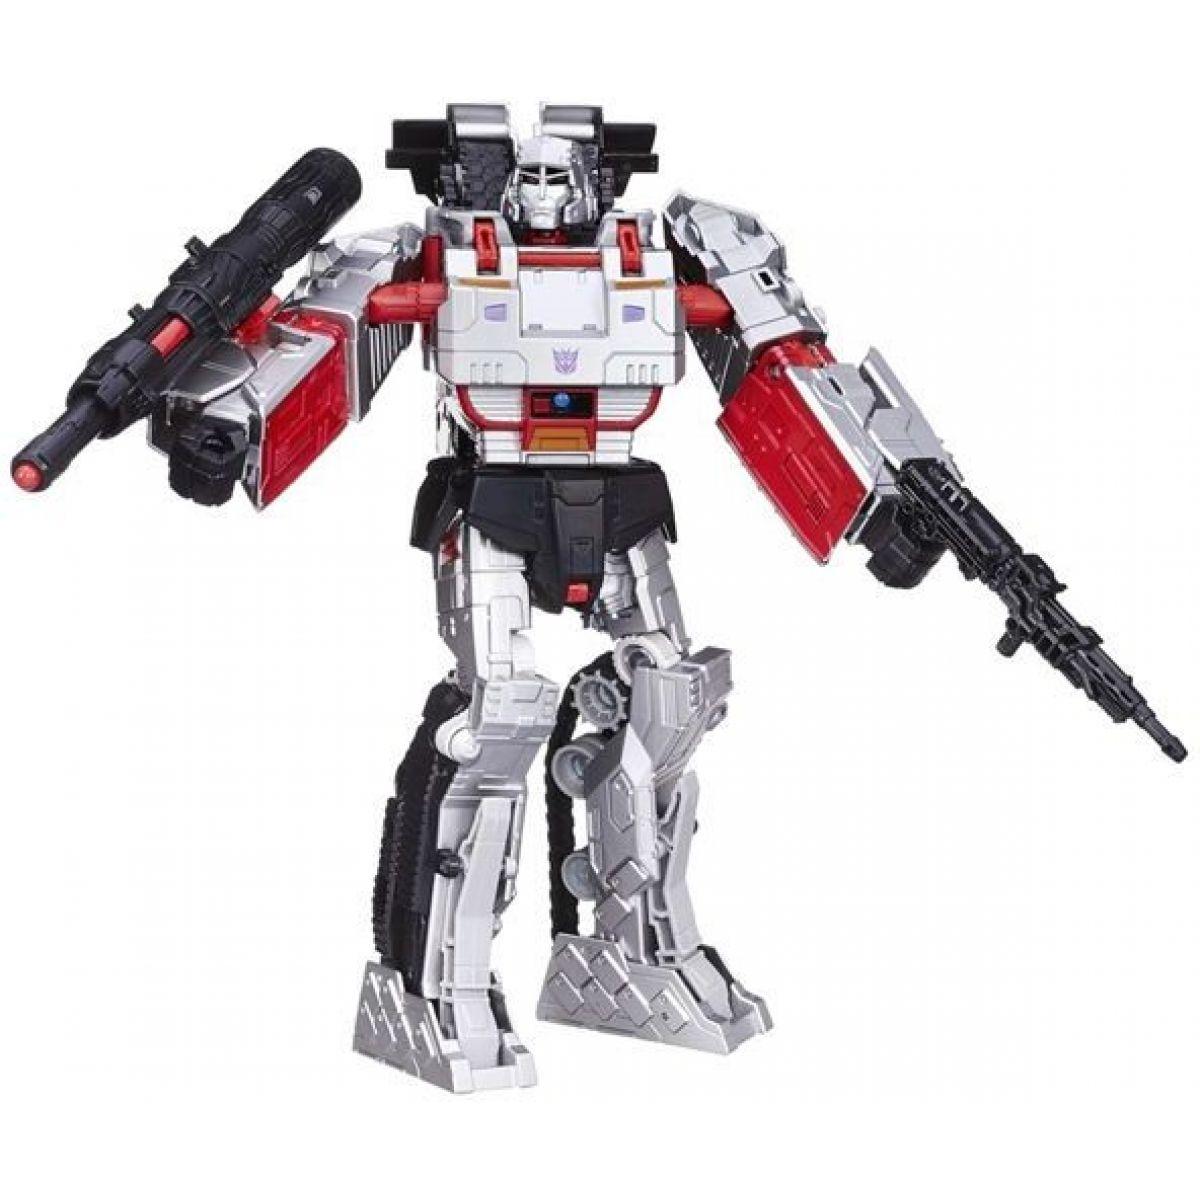 Hasbro Transformers pohyblivý Transformer s akčními doplňky - Megatron